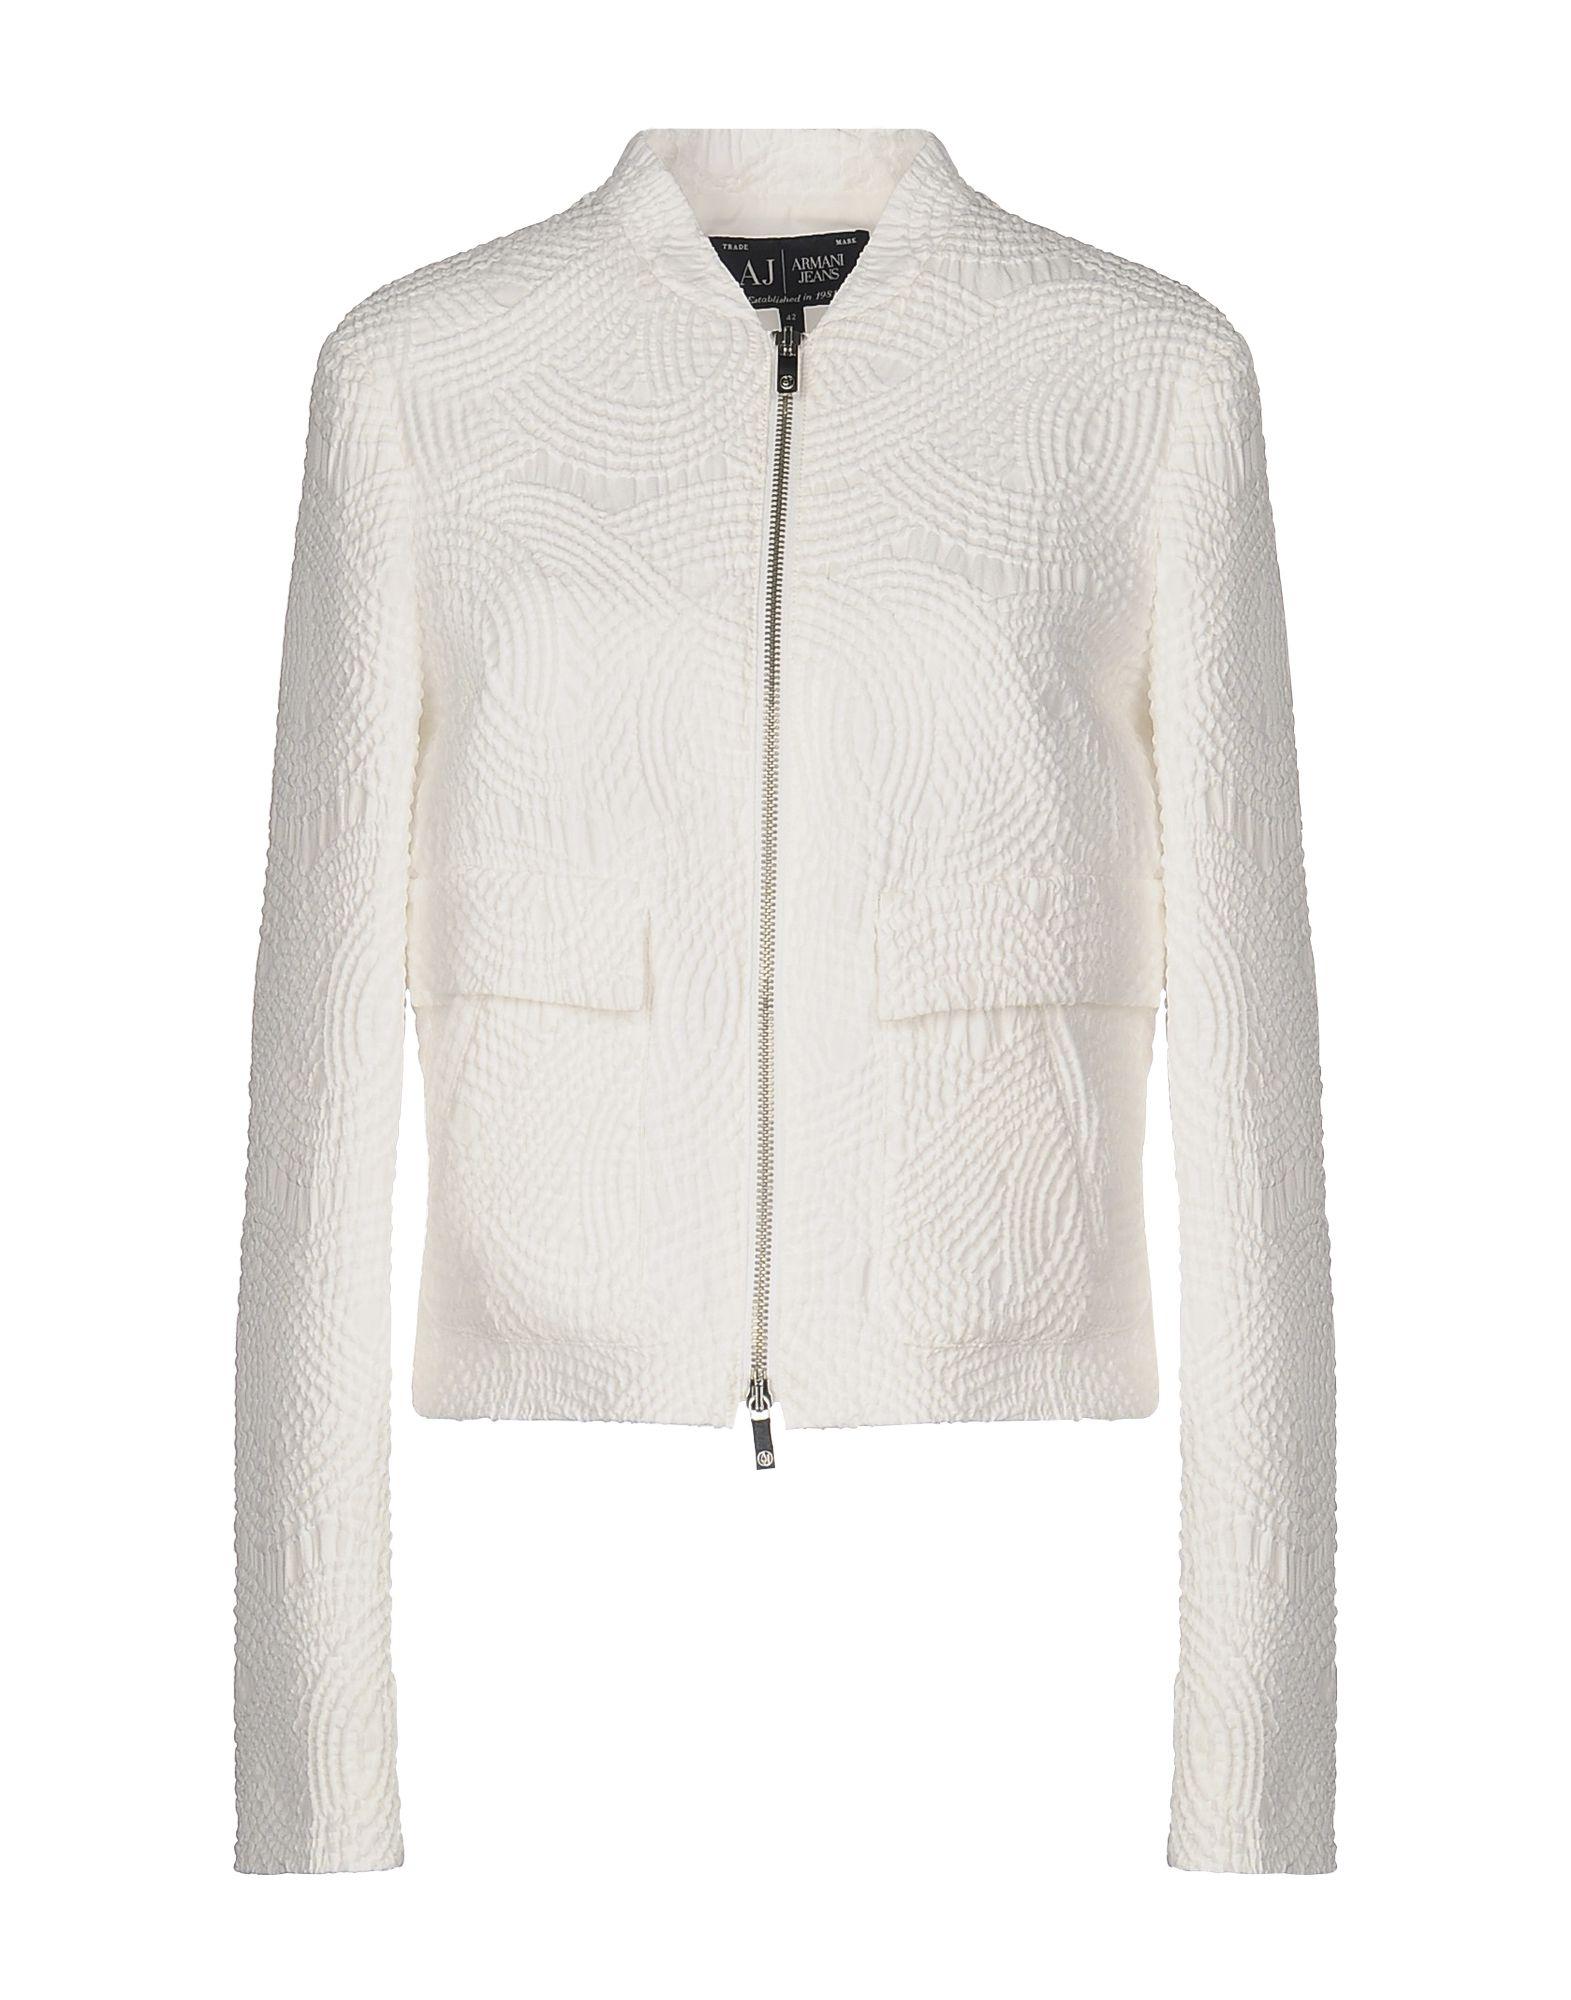 Giacca Armani Jeans Donna - Acquista online su vckigK